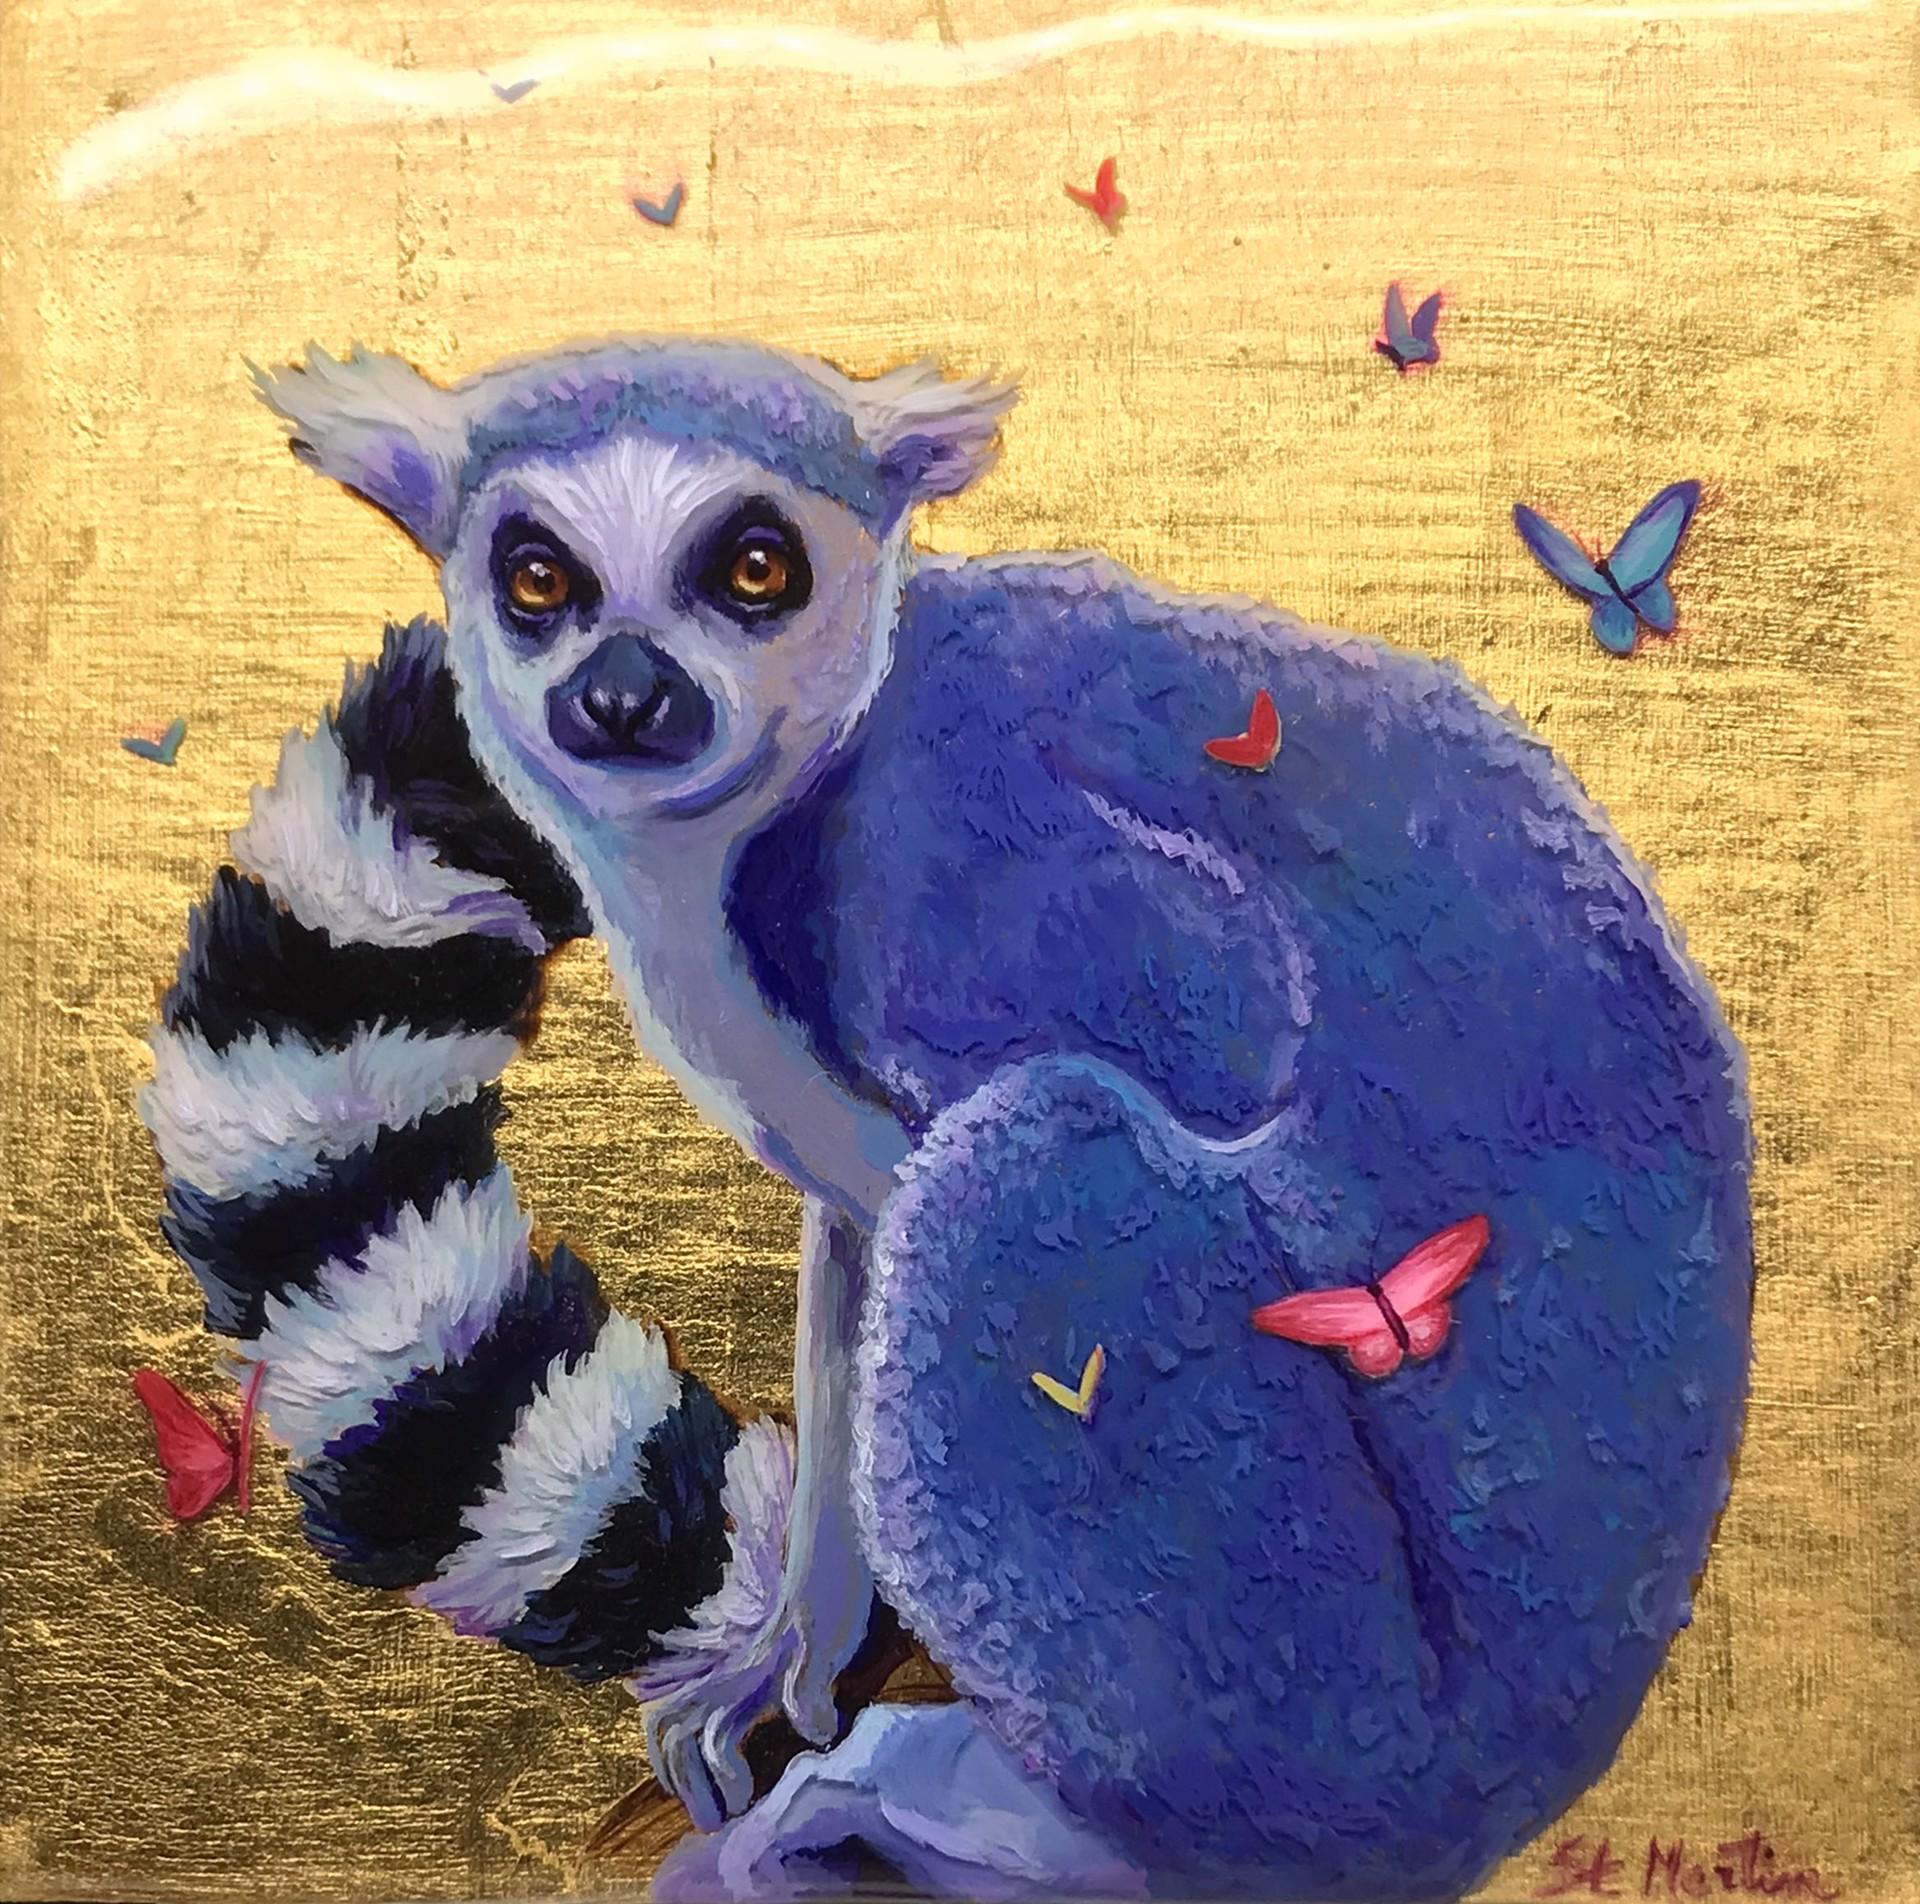 Lemur by Corina St. Martin